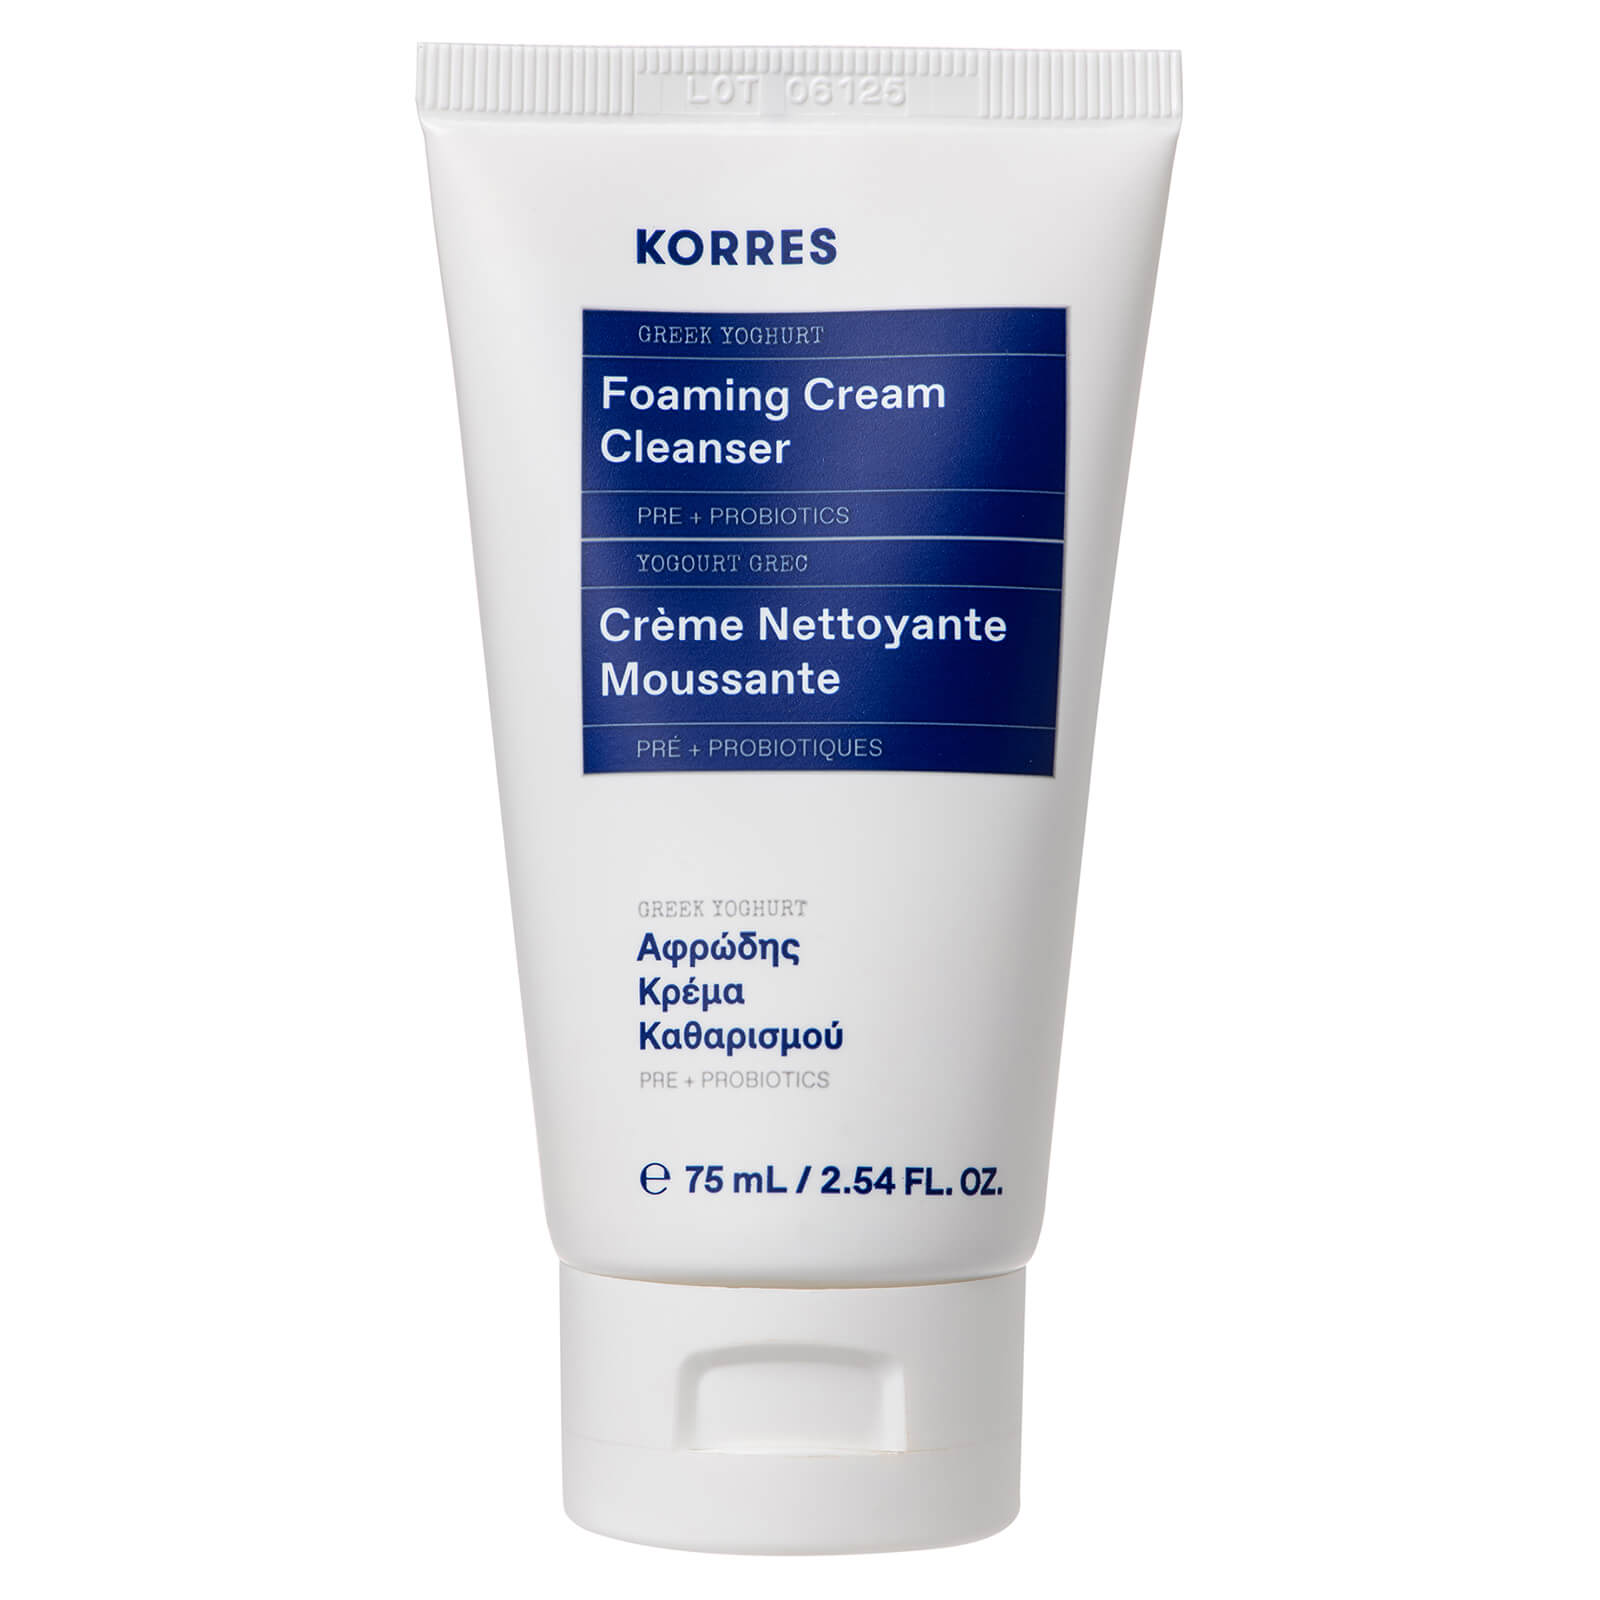 Купить KORRES Greek Yoghurt Foaming Cream Cleanser 75ml